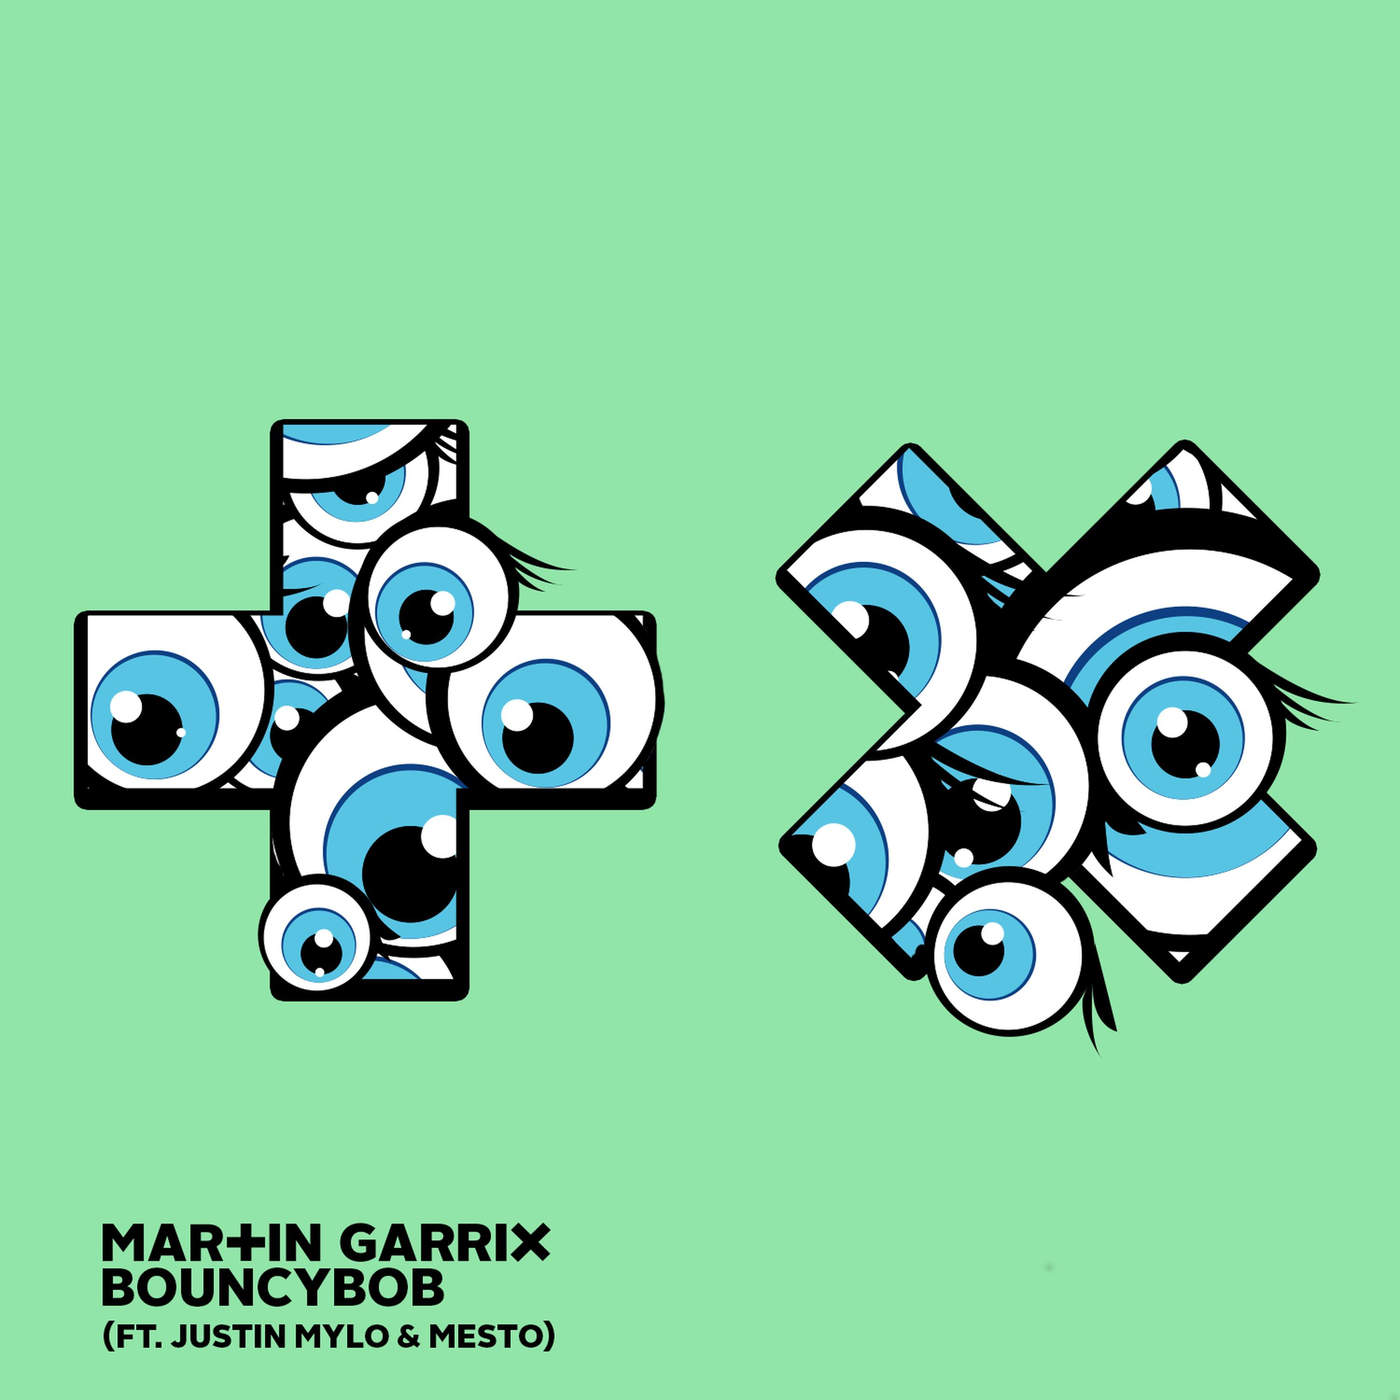 Martin Garrix - Bouncybob (feat. Justin Mylo & Mesto) - Single Cover